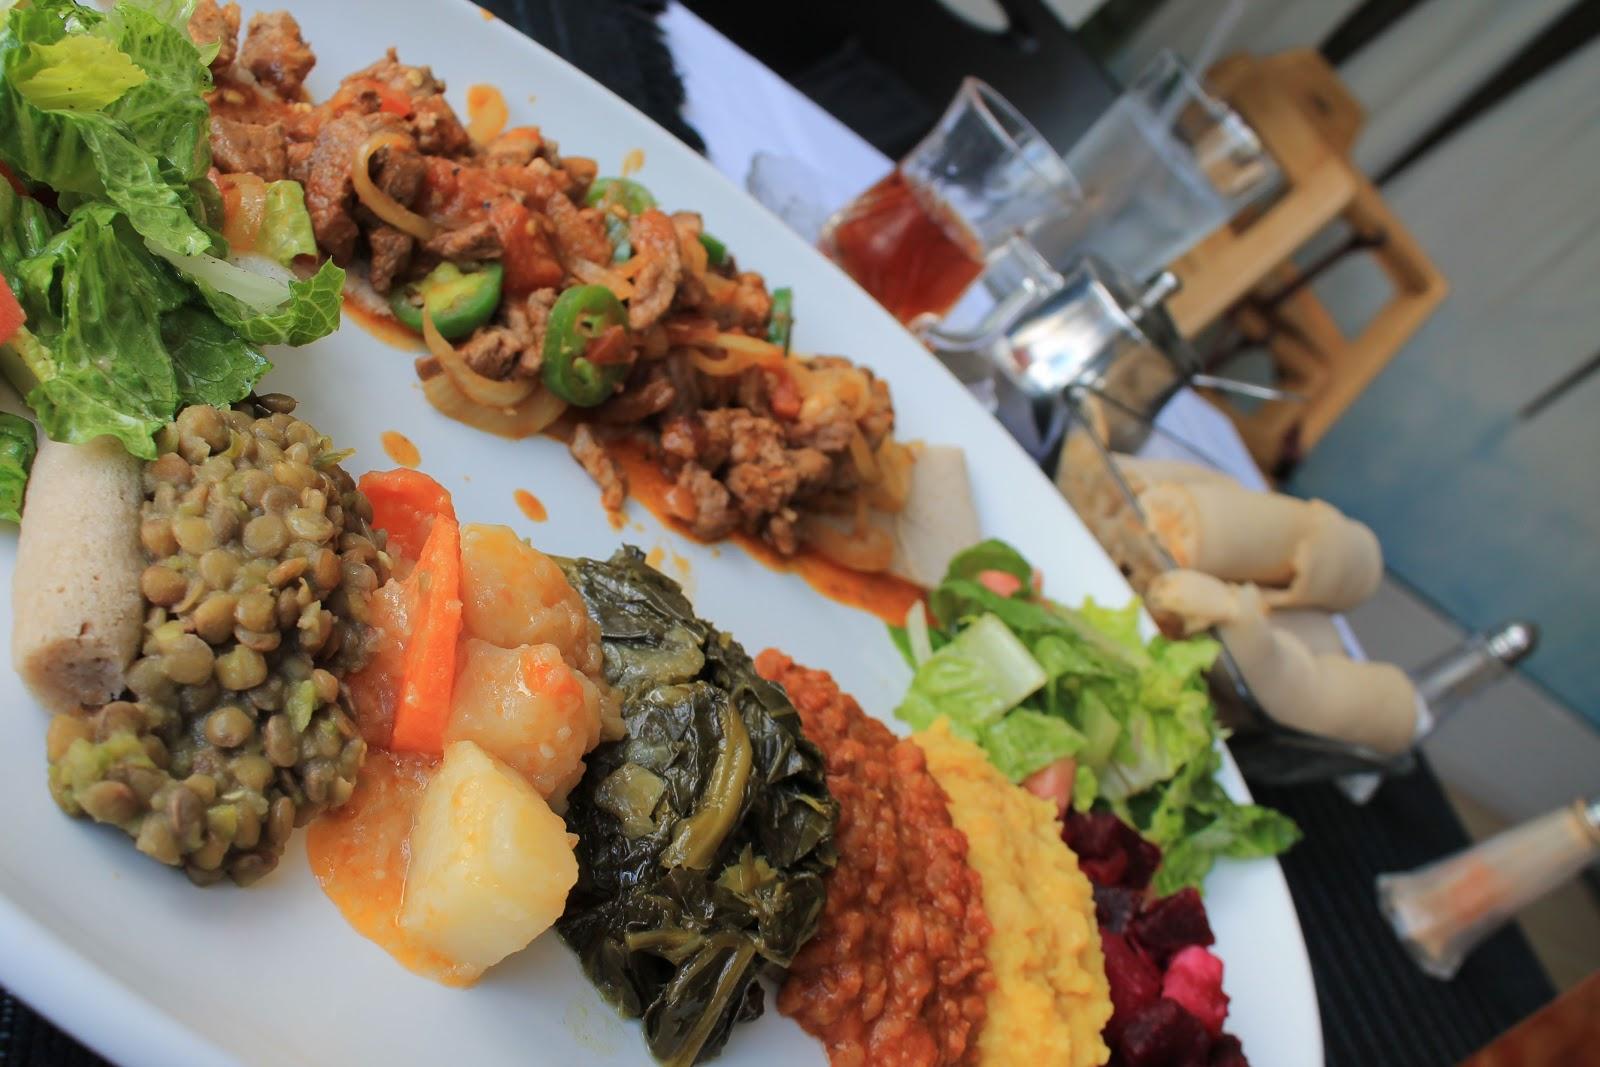 Nile ethiopian restaurant mouth brothels